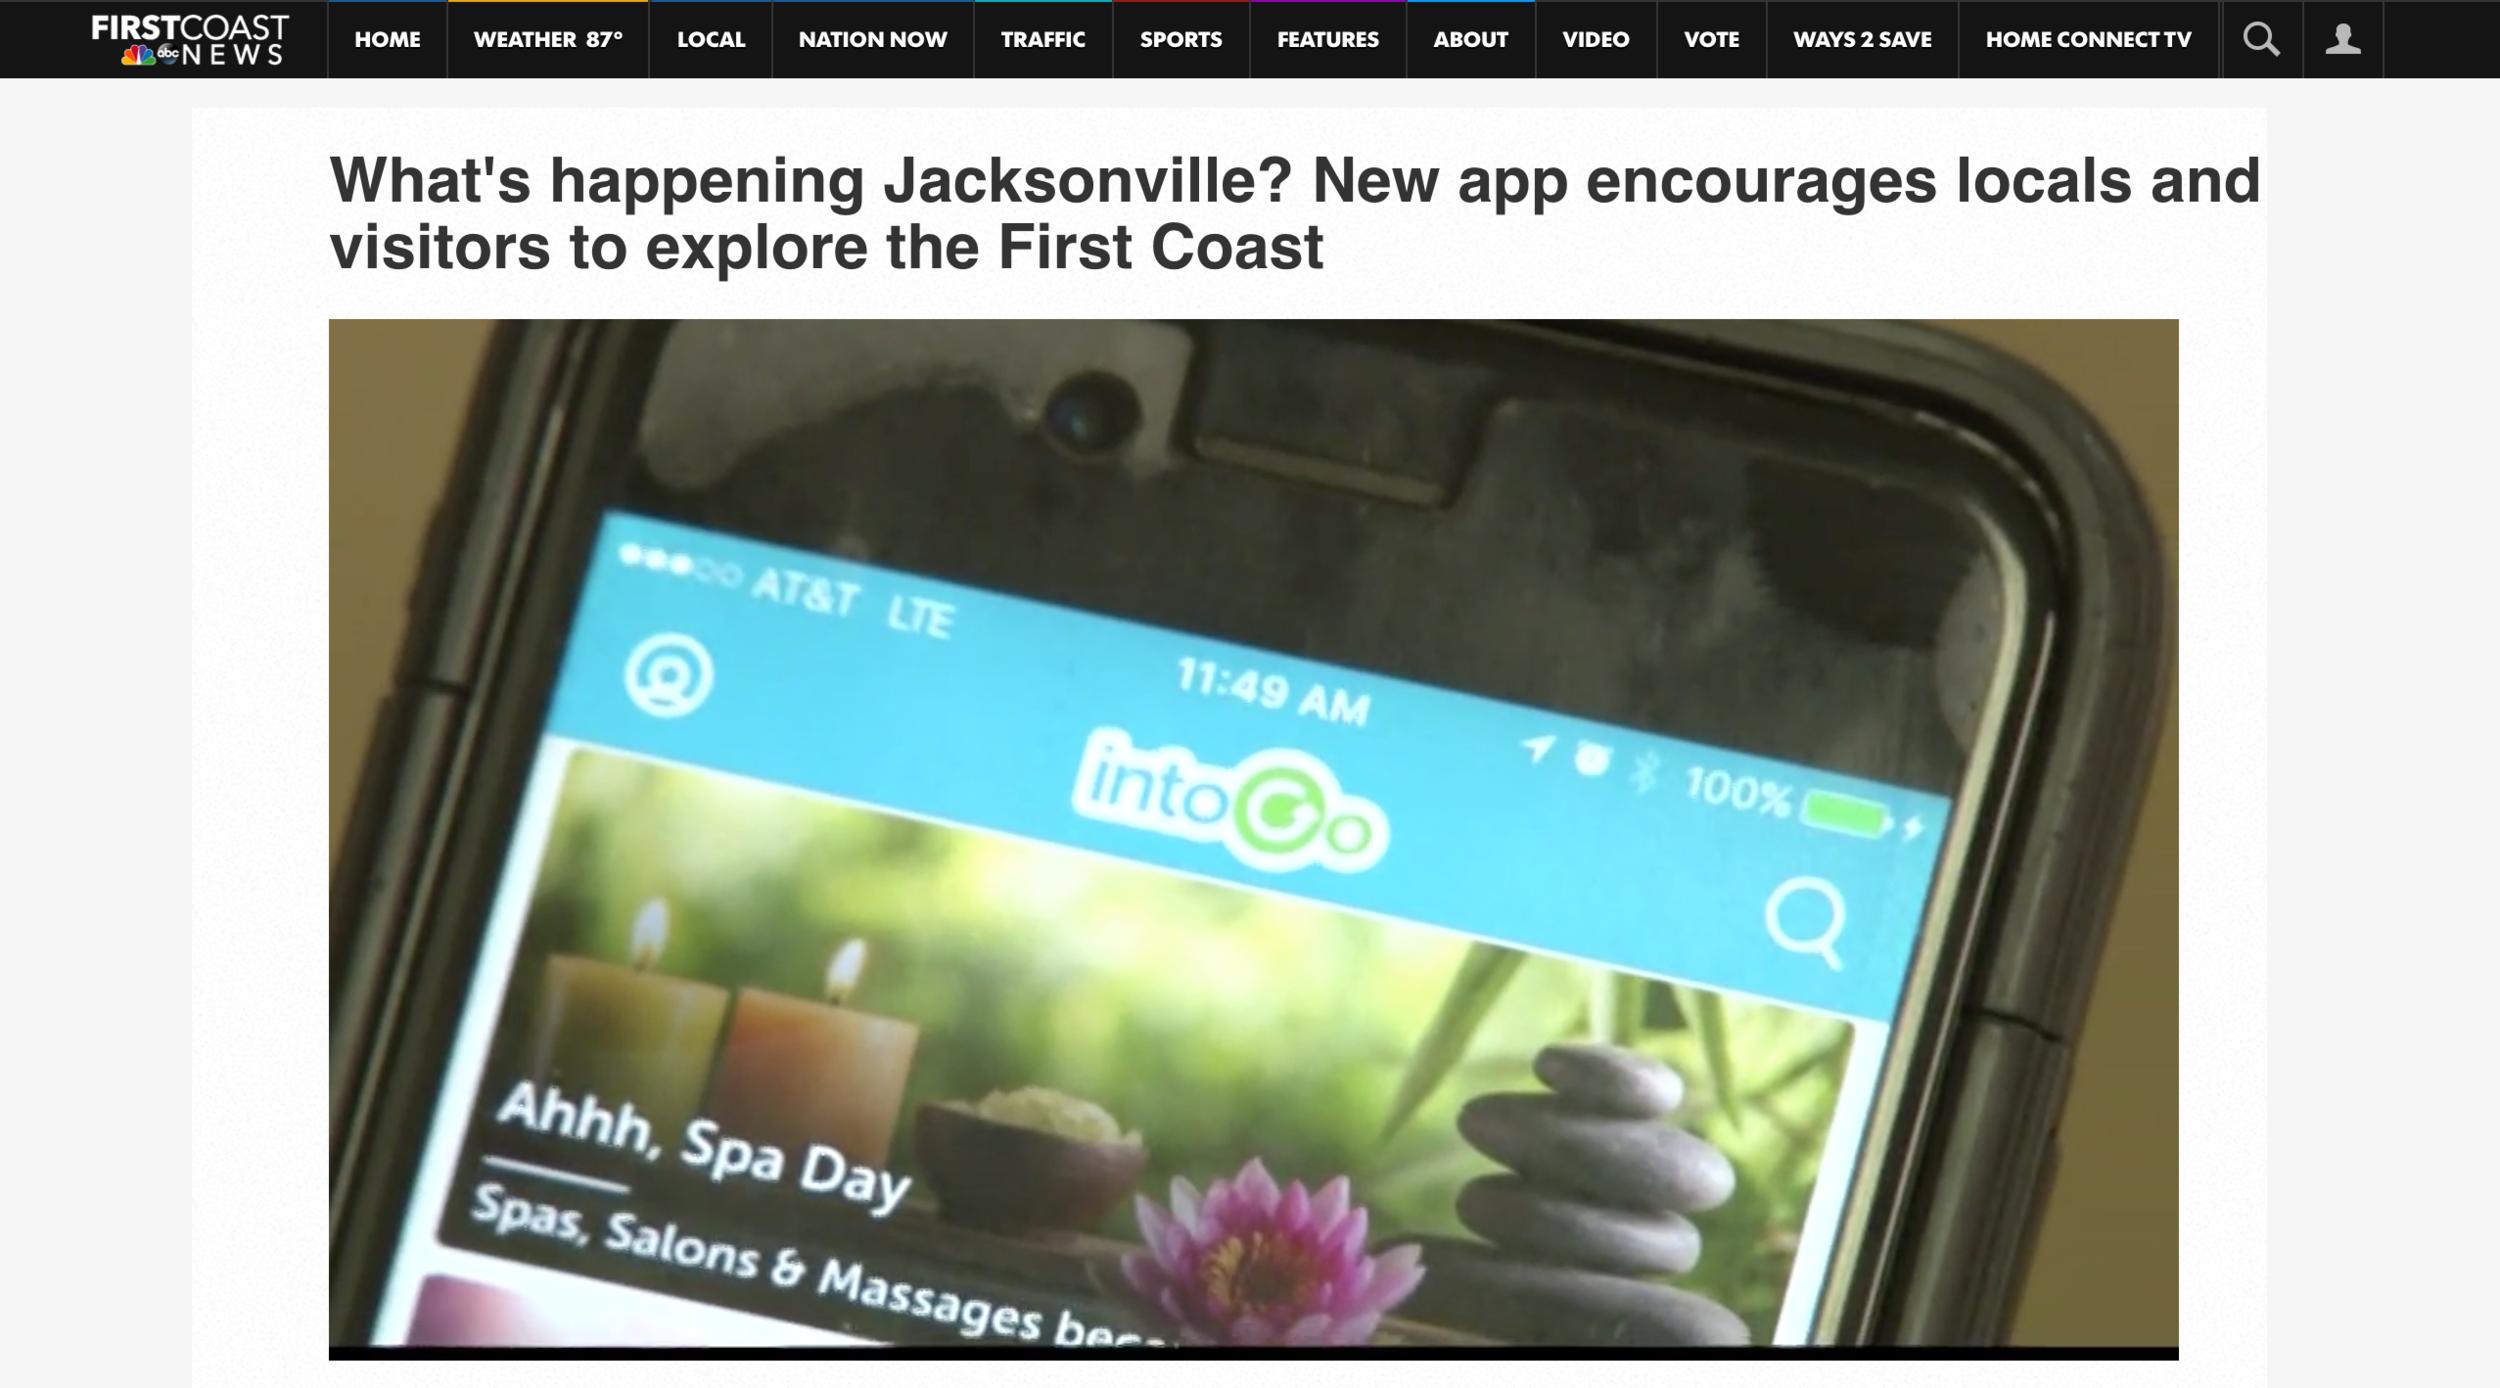 intoGo on First Coast News